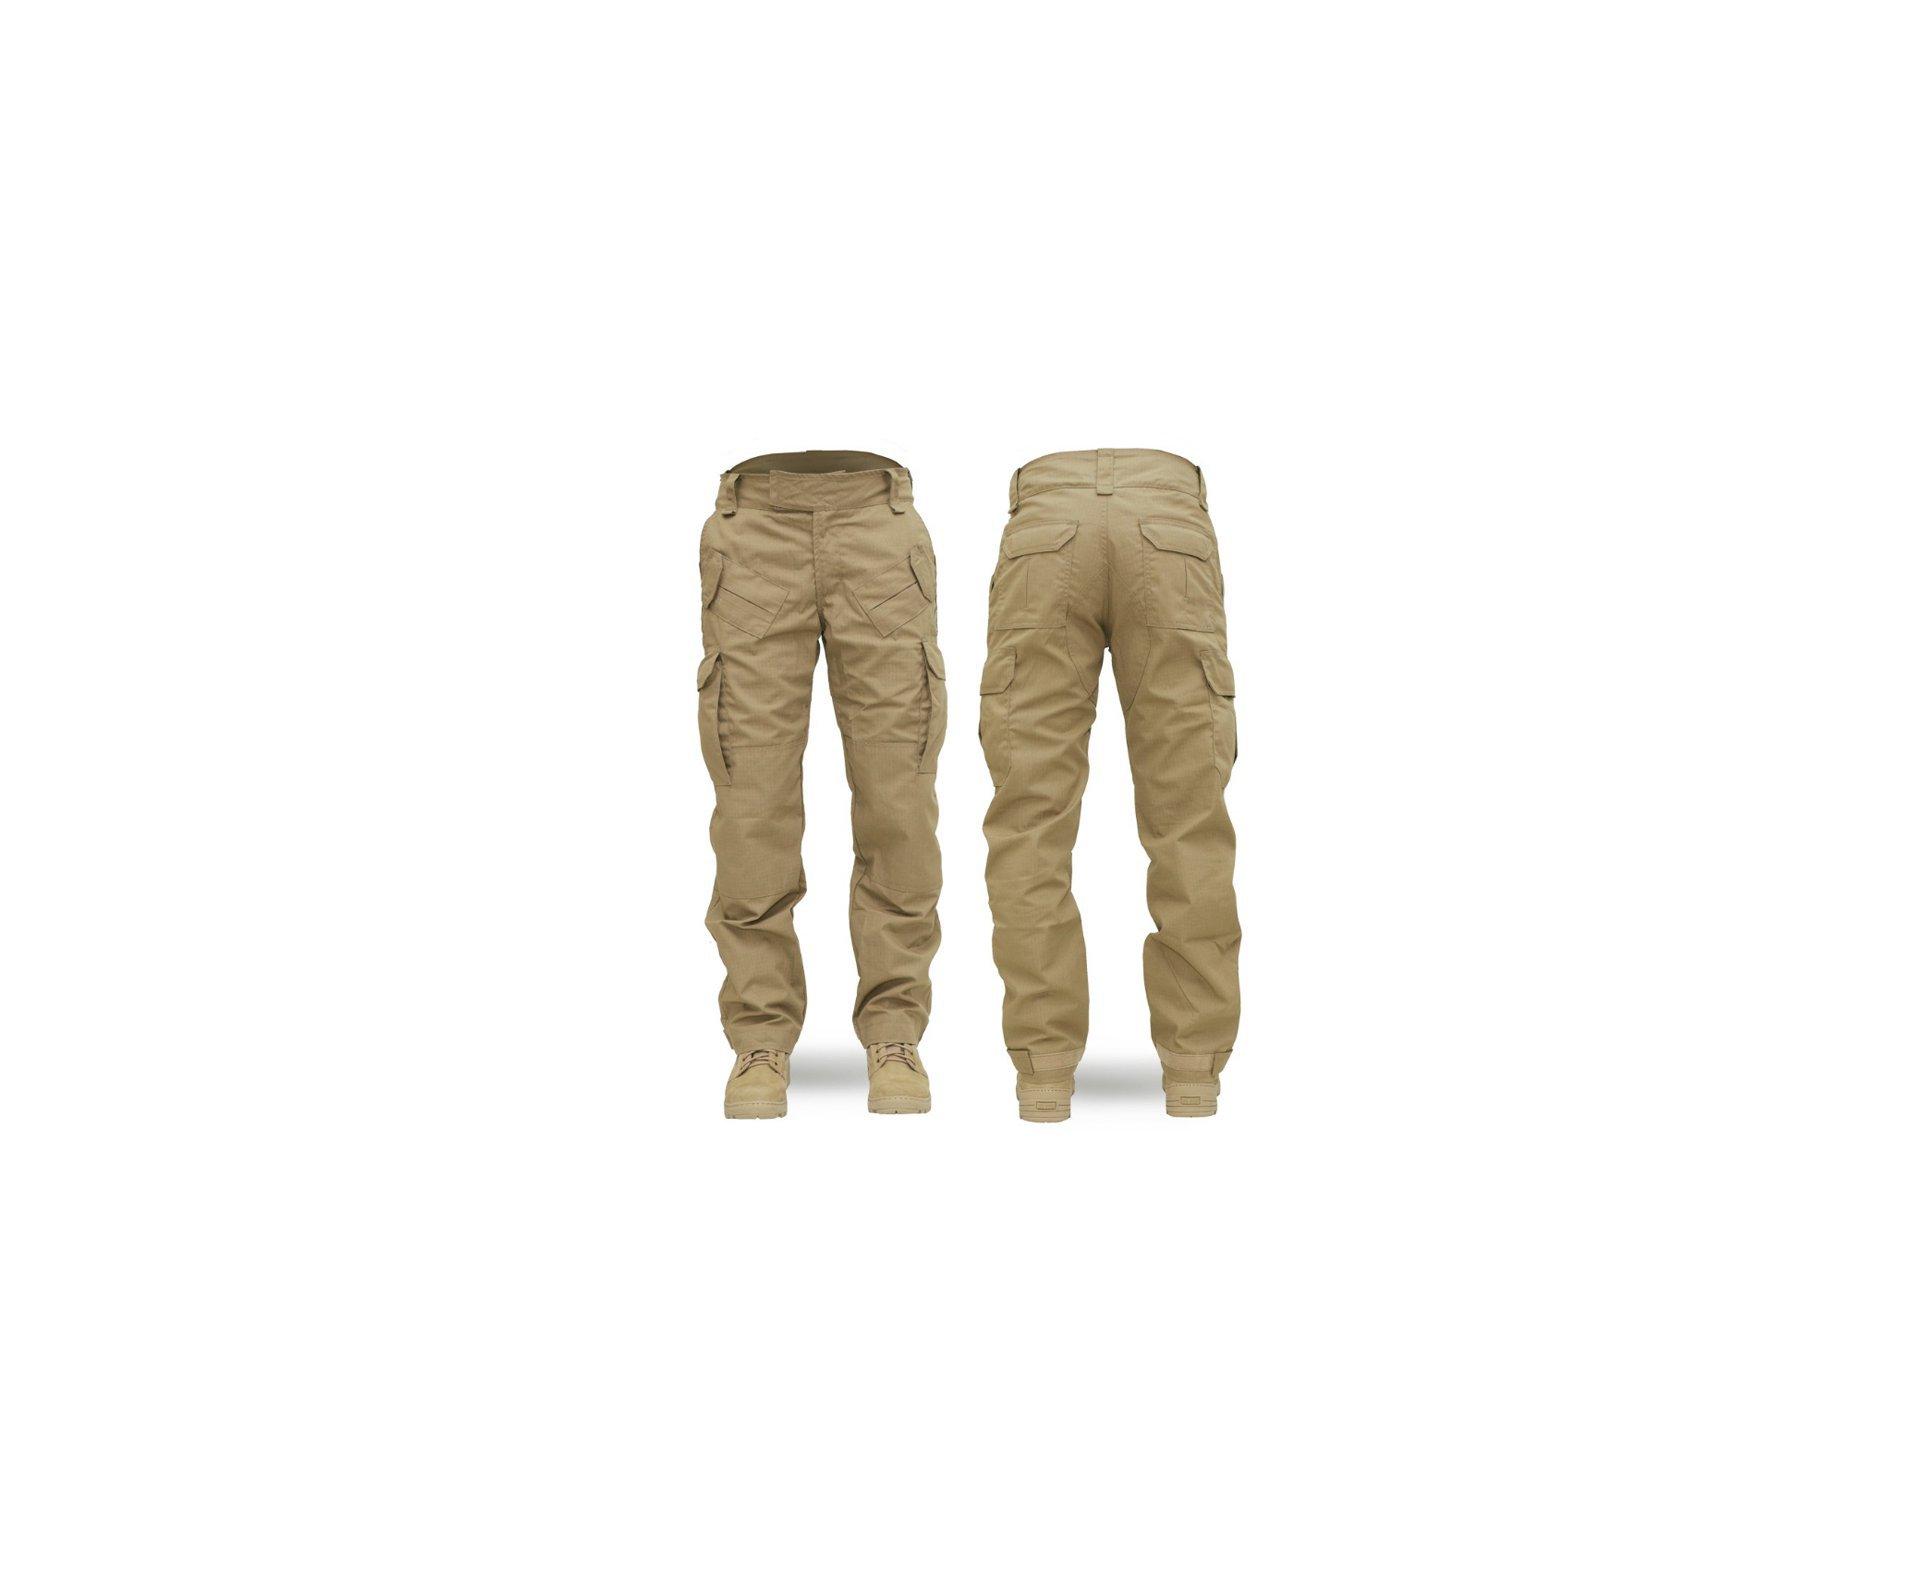 Calça Forhonor 911 Desert - Tatica, Militar, Airsoft, Ripstop